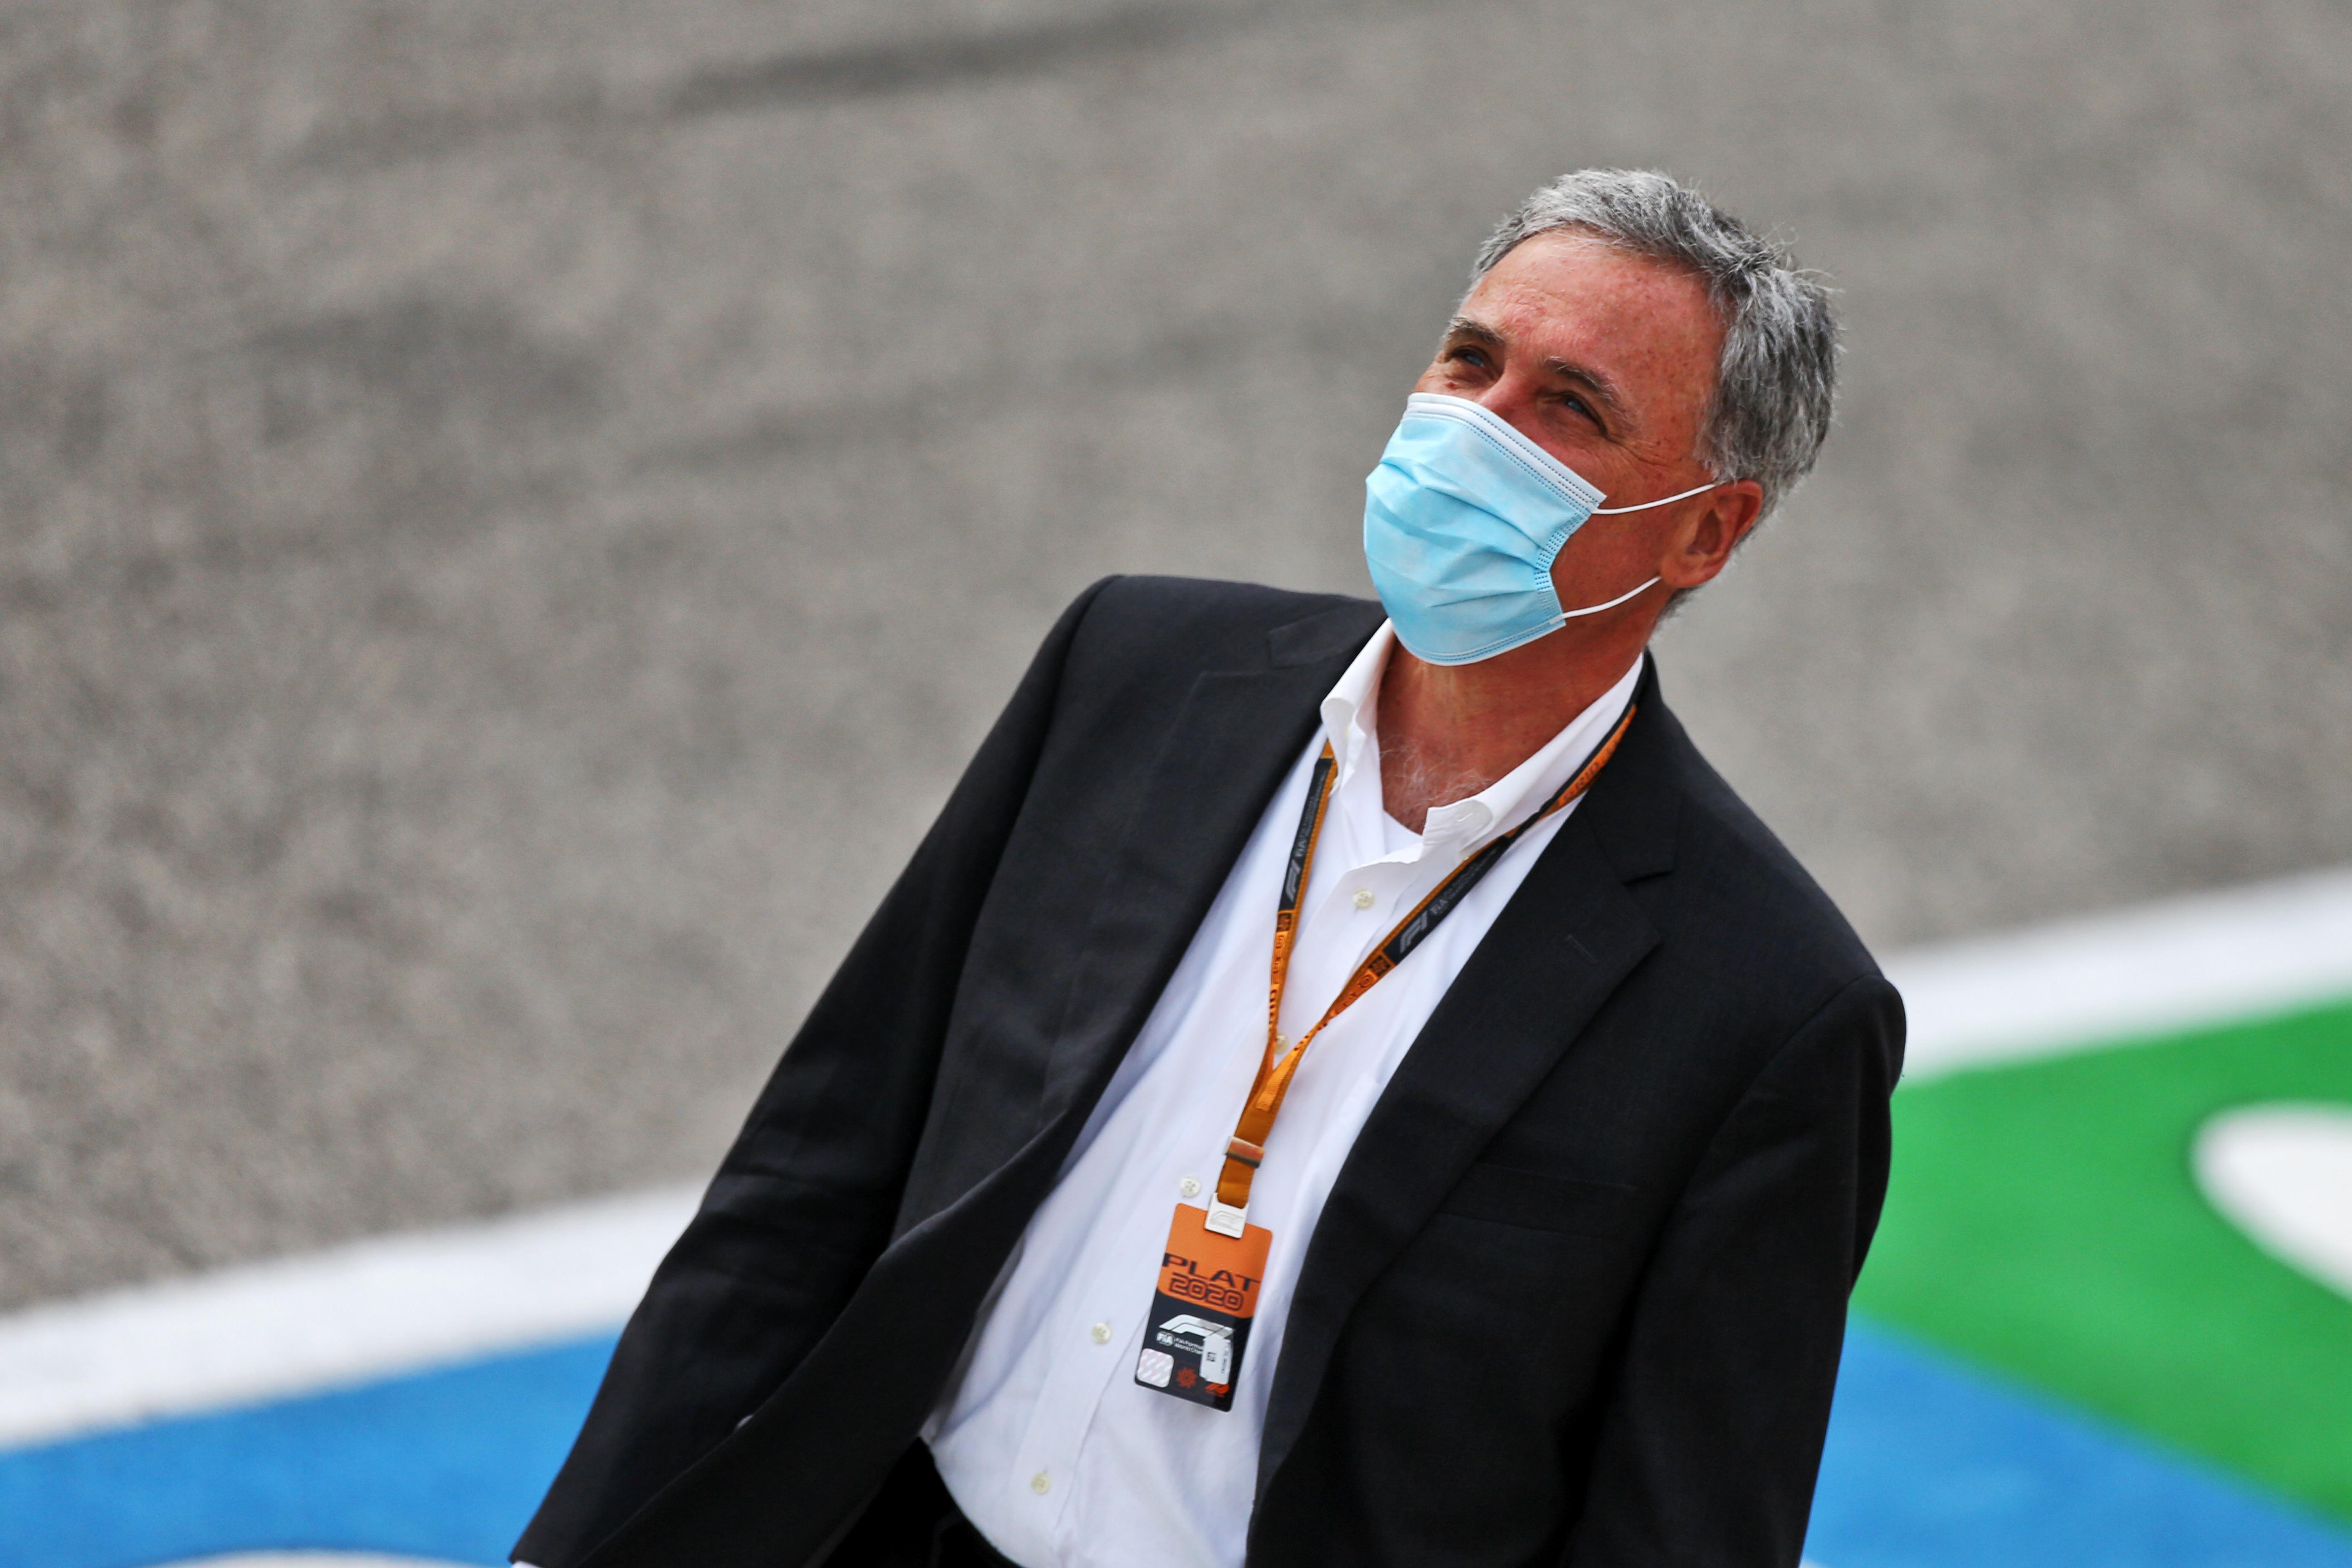 Motor Racing Formula One World Championship Emilia Romagna Grand Prix Race Day Imola, Italy